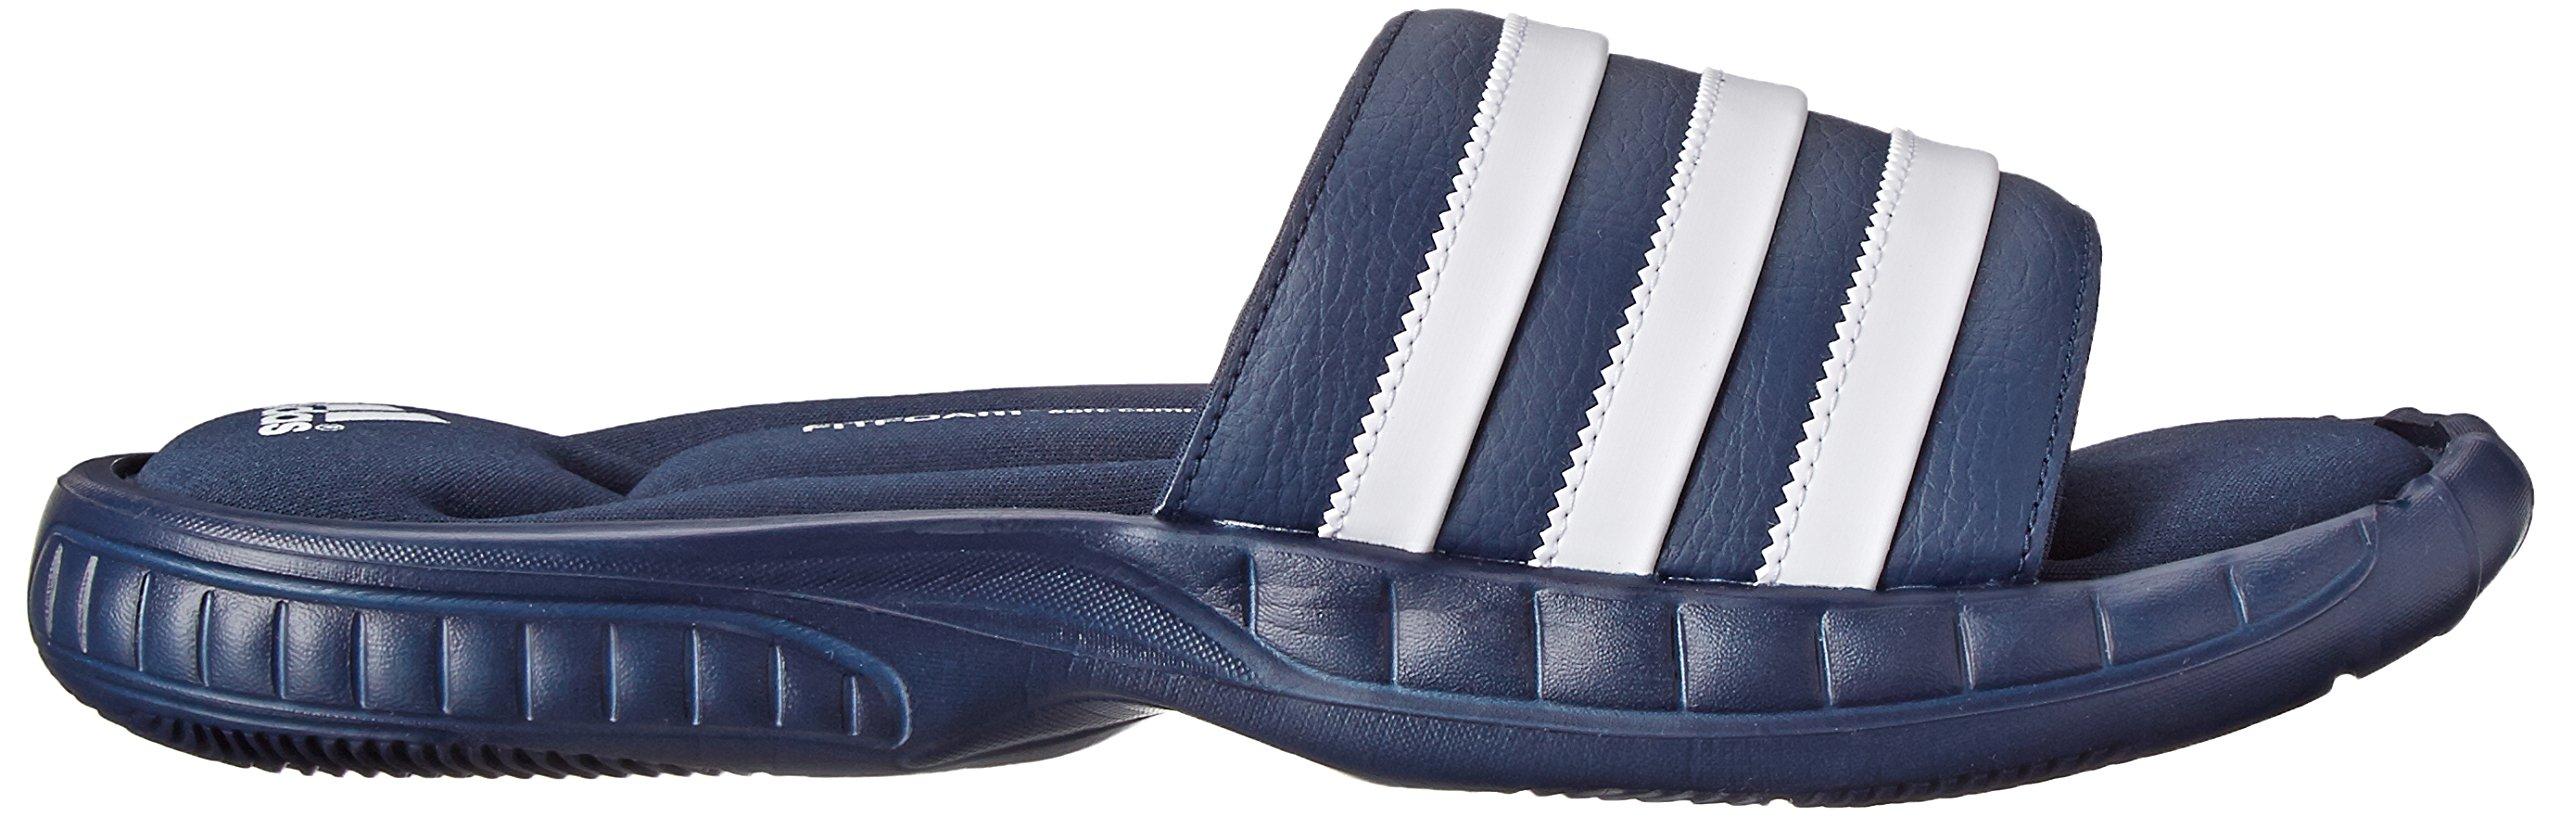 aecbbbcf32c1 adidas Performance Men s Superstar 3G Slide Sandal